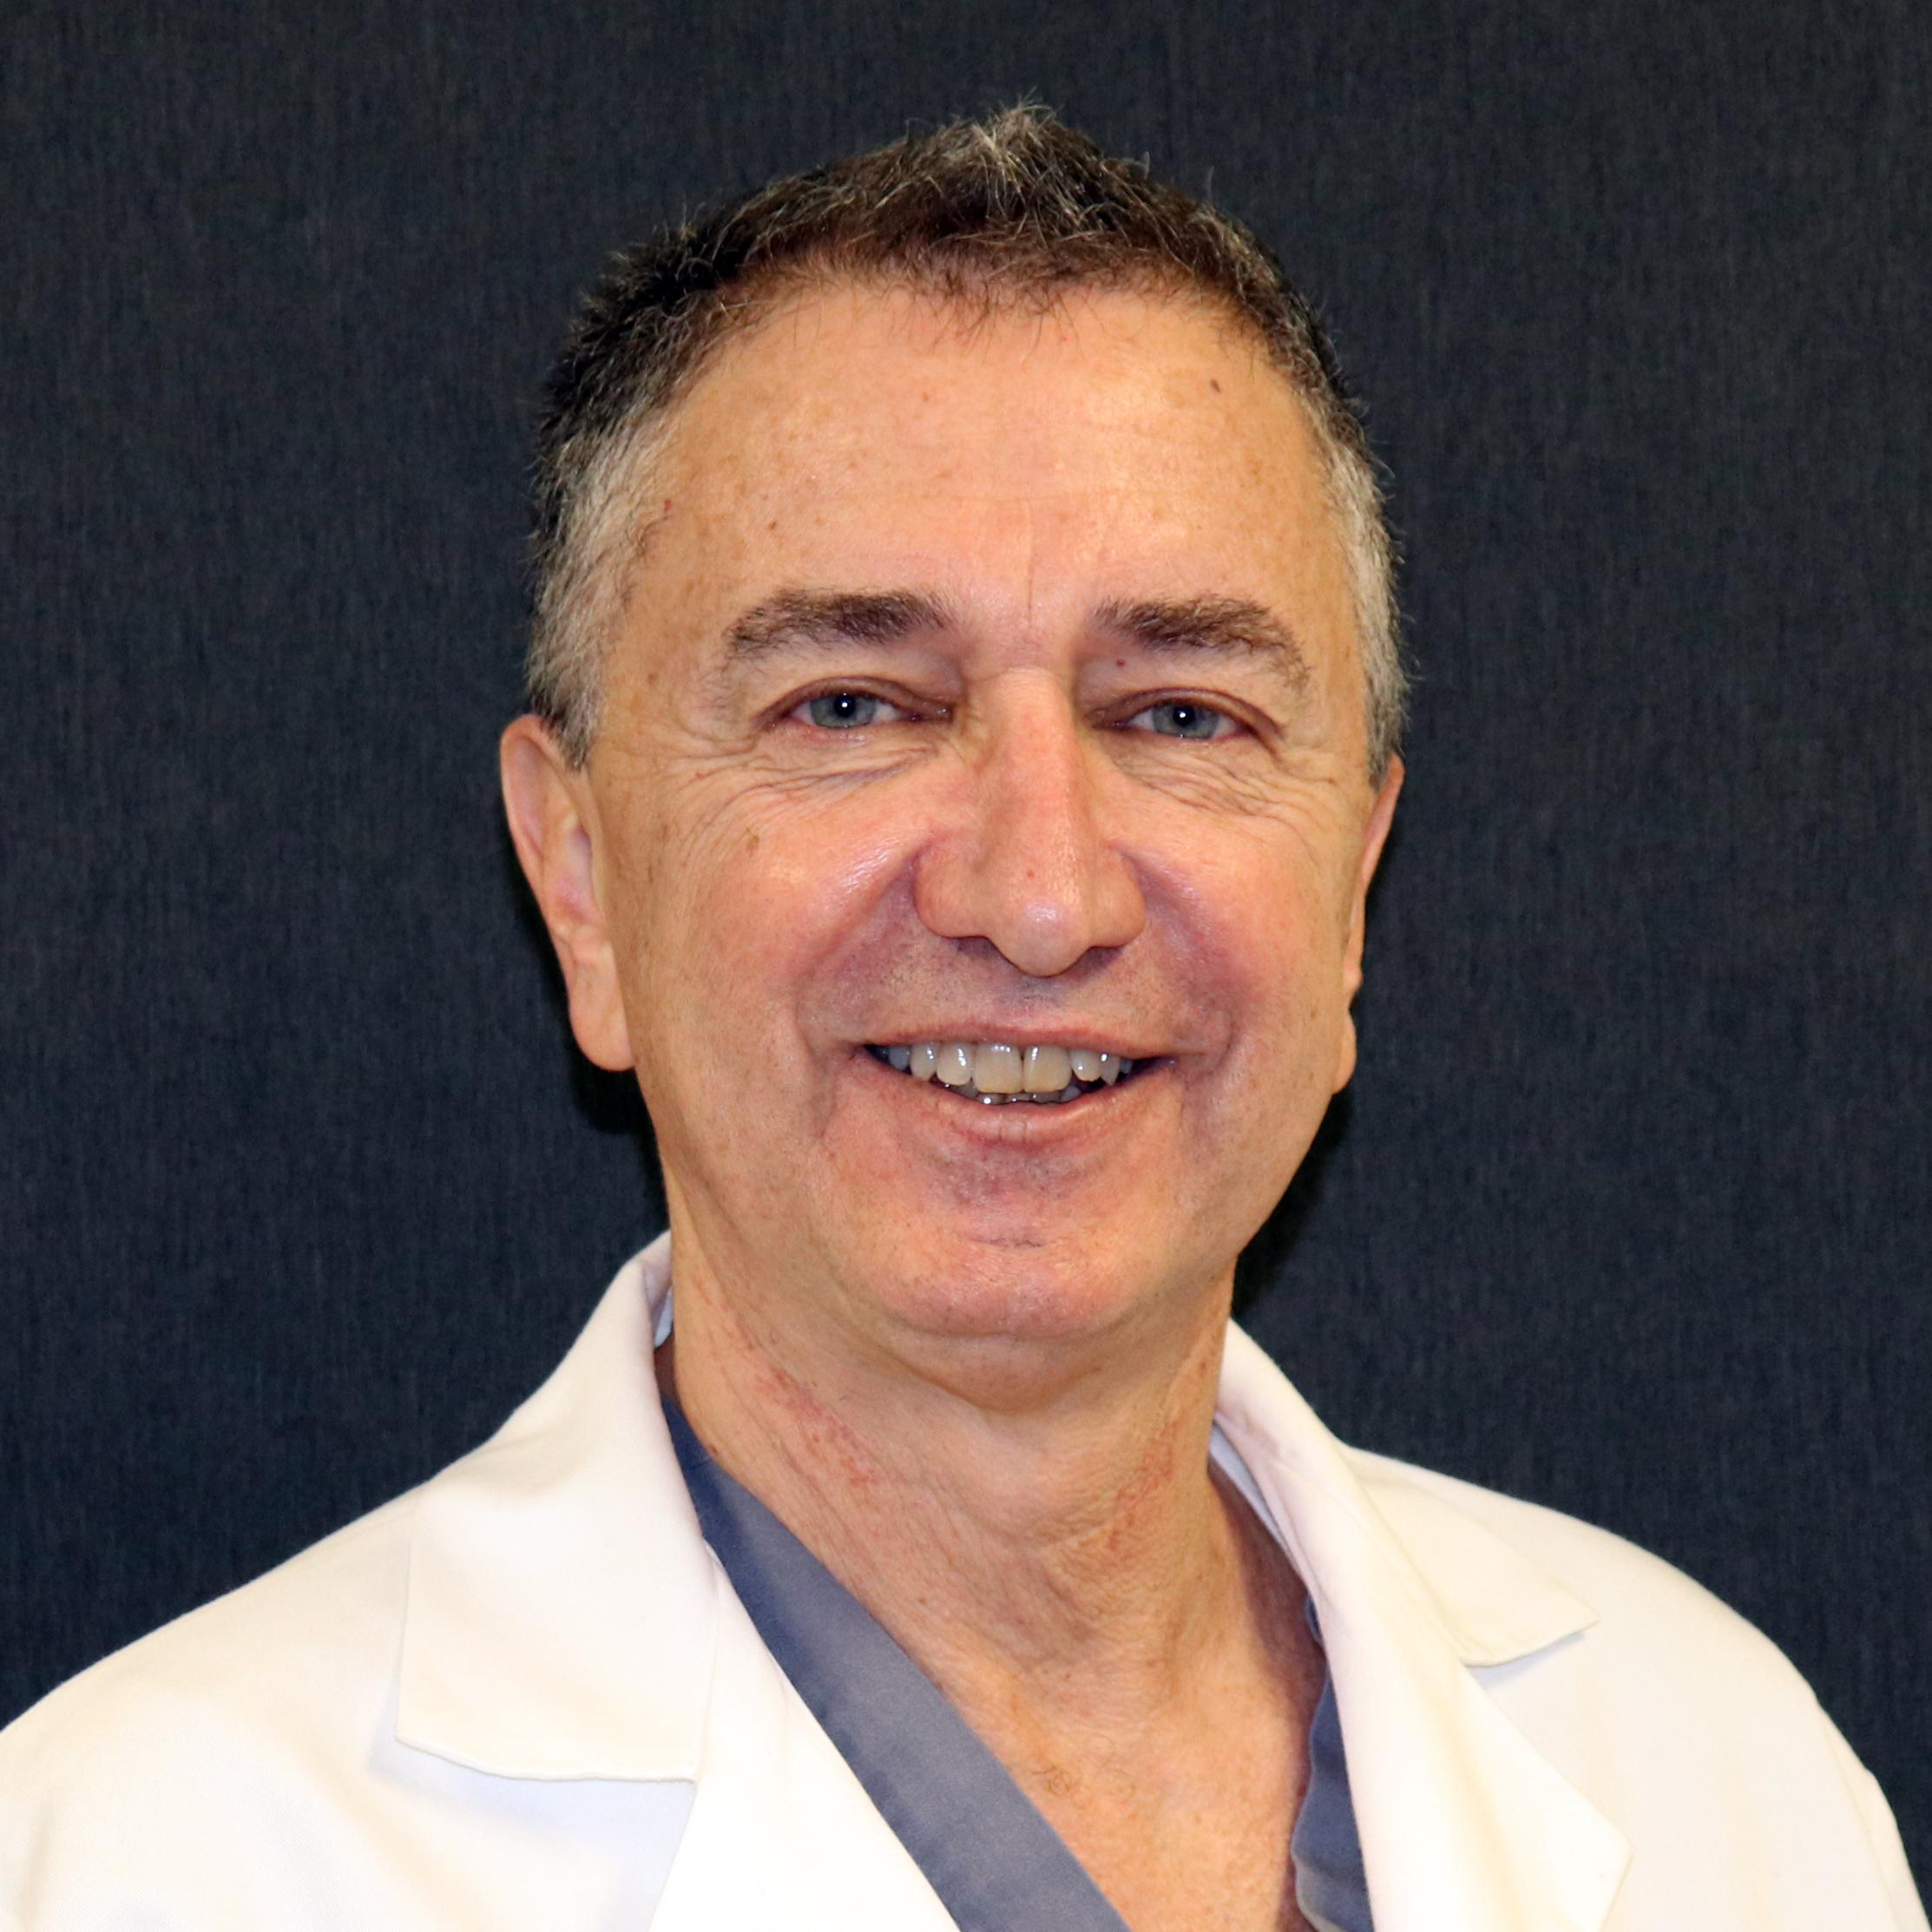 Norman Miller, MD, FACG